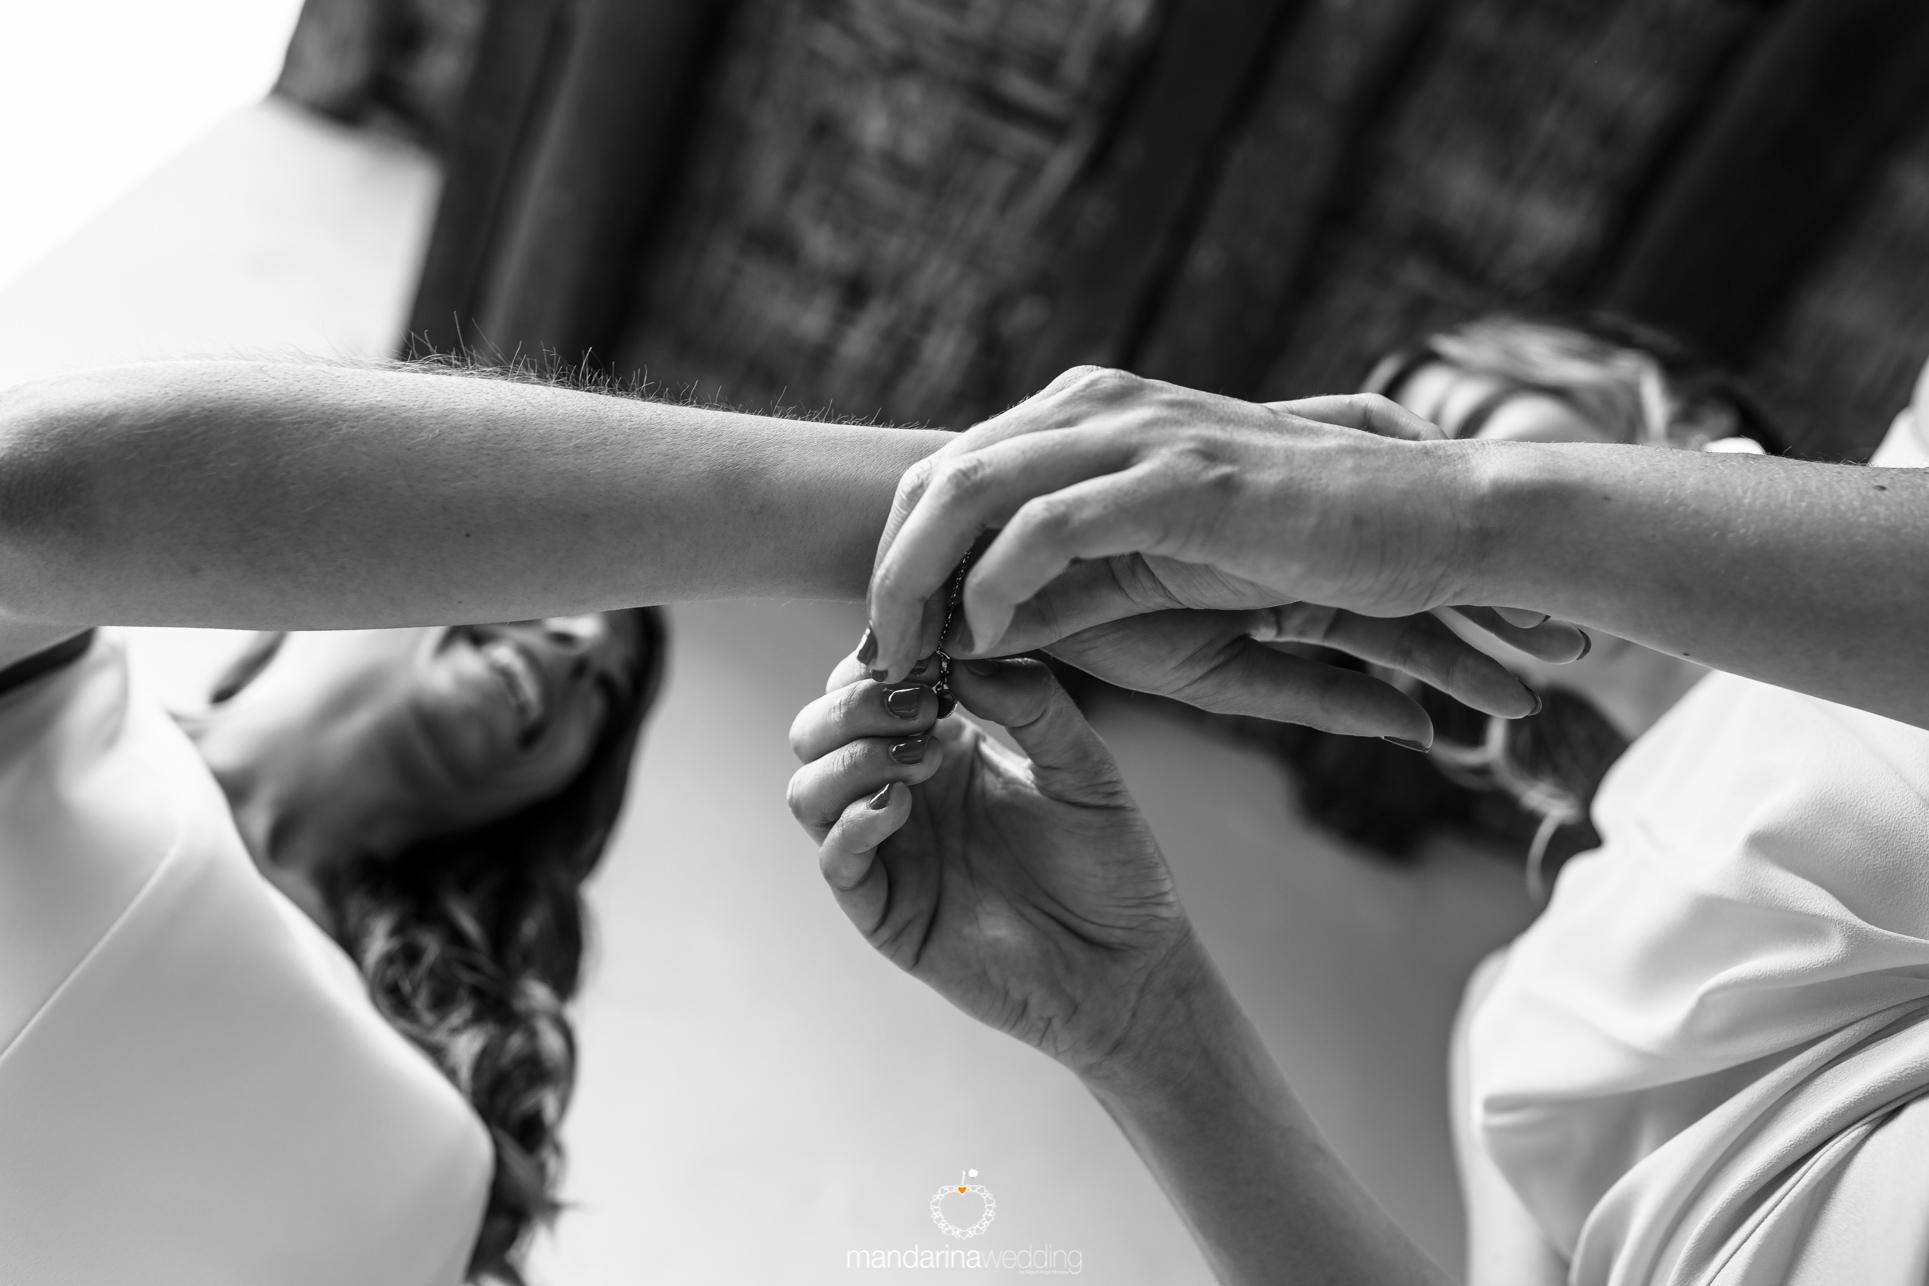 mandarina wedding, fotografo boda pais vasco, fotografo boda zaragoza, fotógrafo boda soria, fotografo boda Madrid, fotógrafo boda tarragona-12